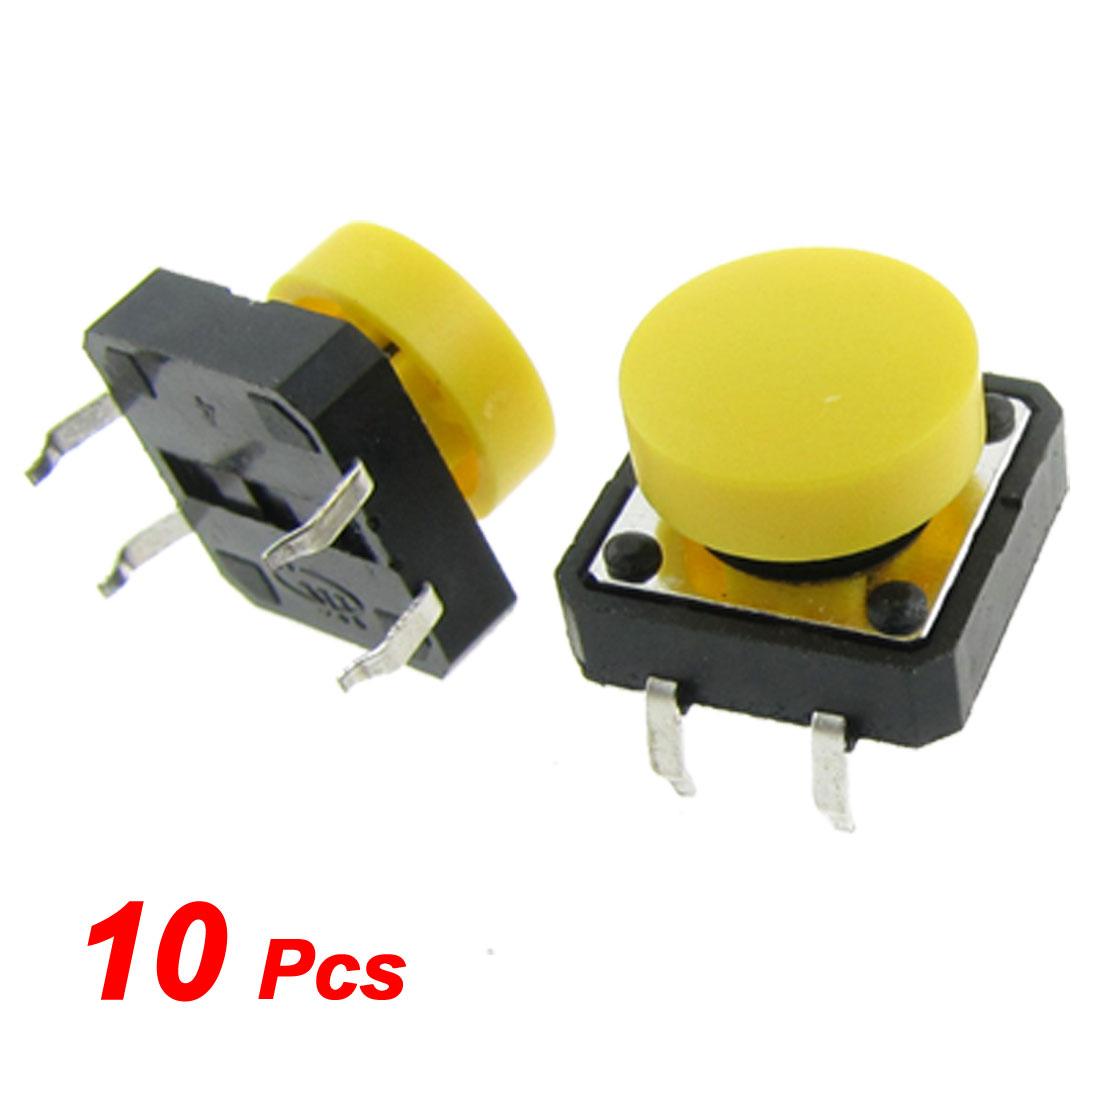 10pcs Momentary Tact Tactile Push Button Switch 12 x 12mm x 8mm 4 Pin DIP + Cap